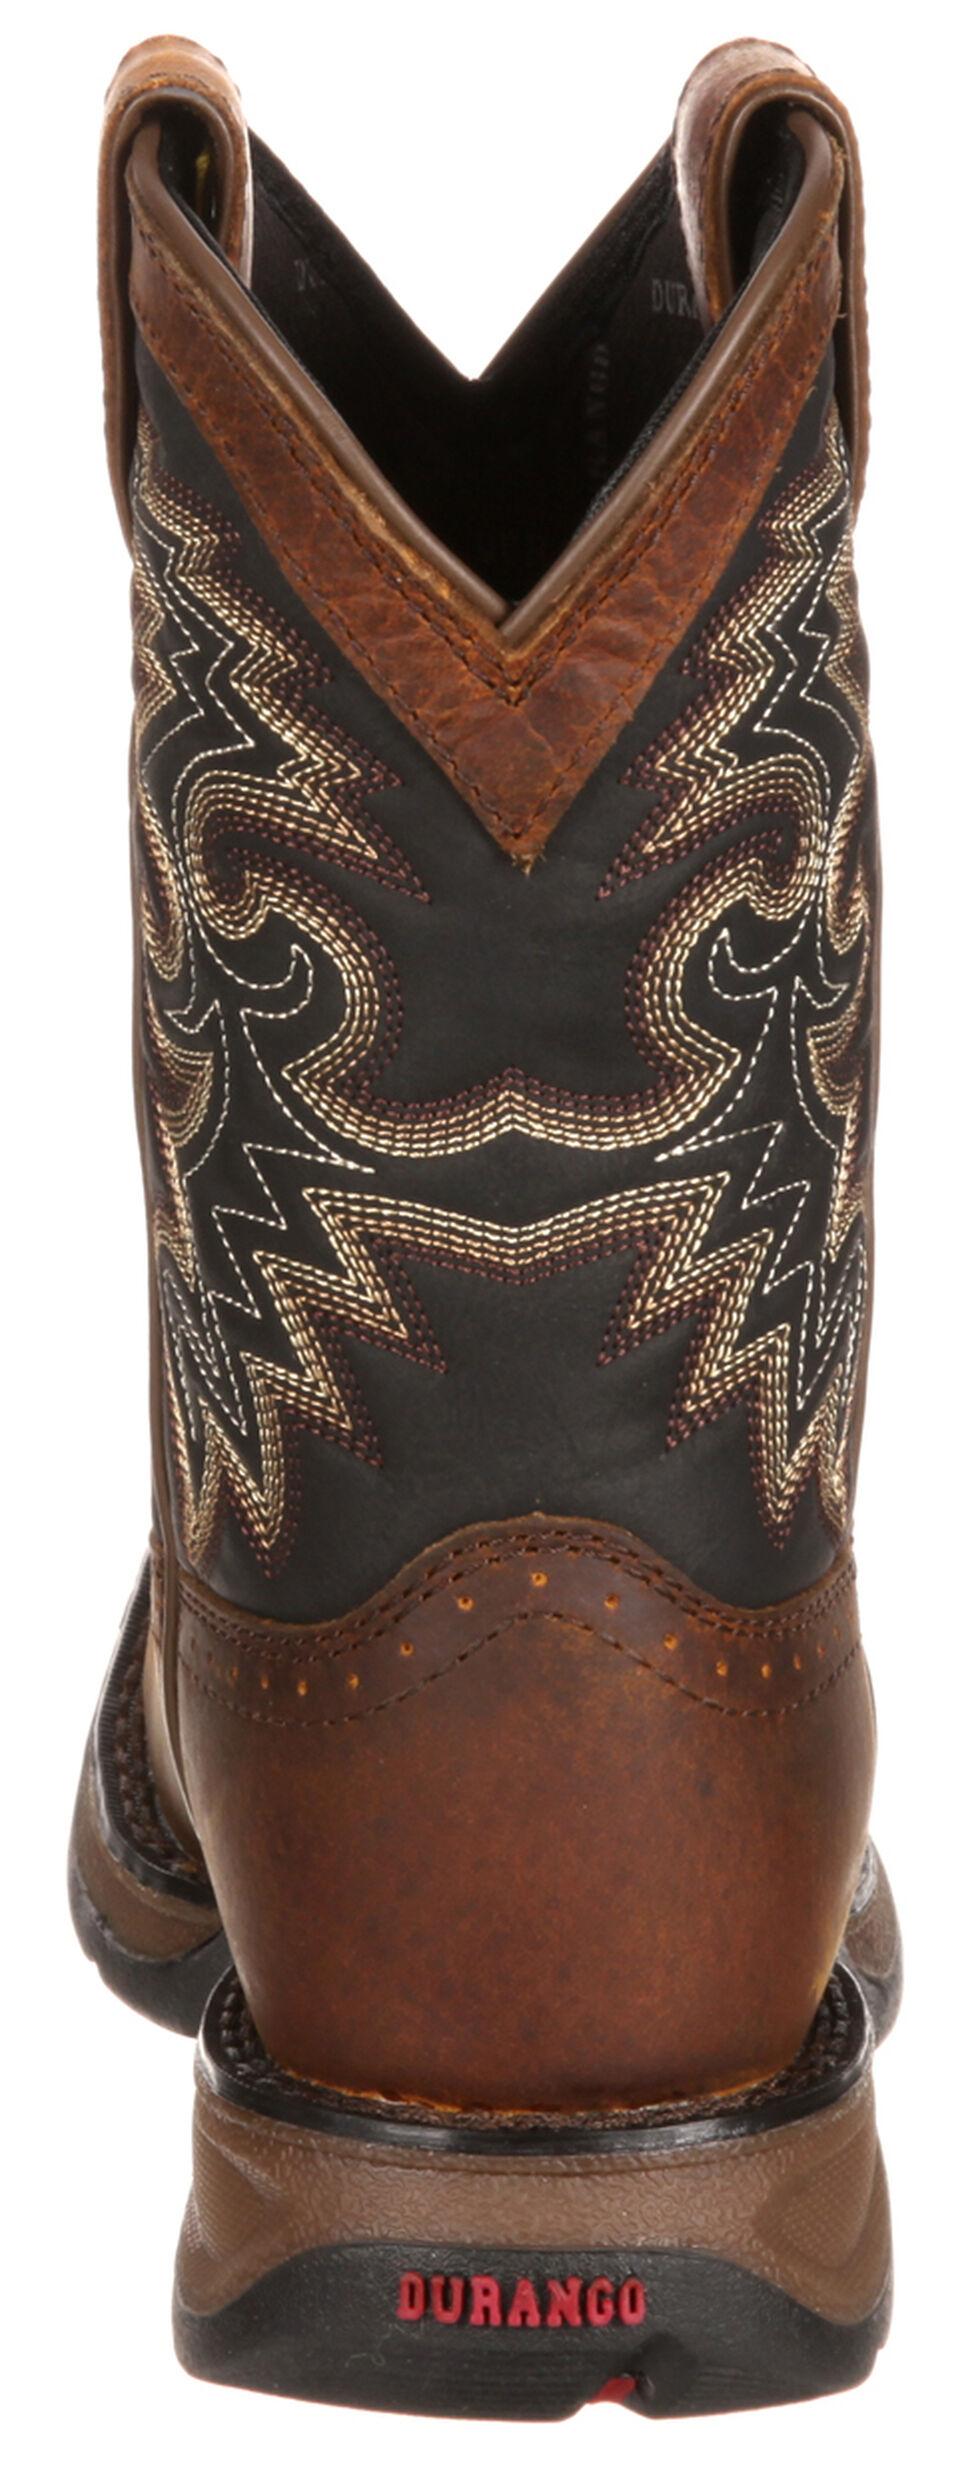 Durango Toddler Boys' Raindrop Western Boots - Square Toe, Tan, hi-res